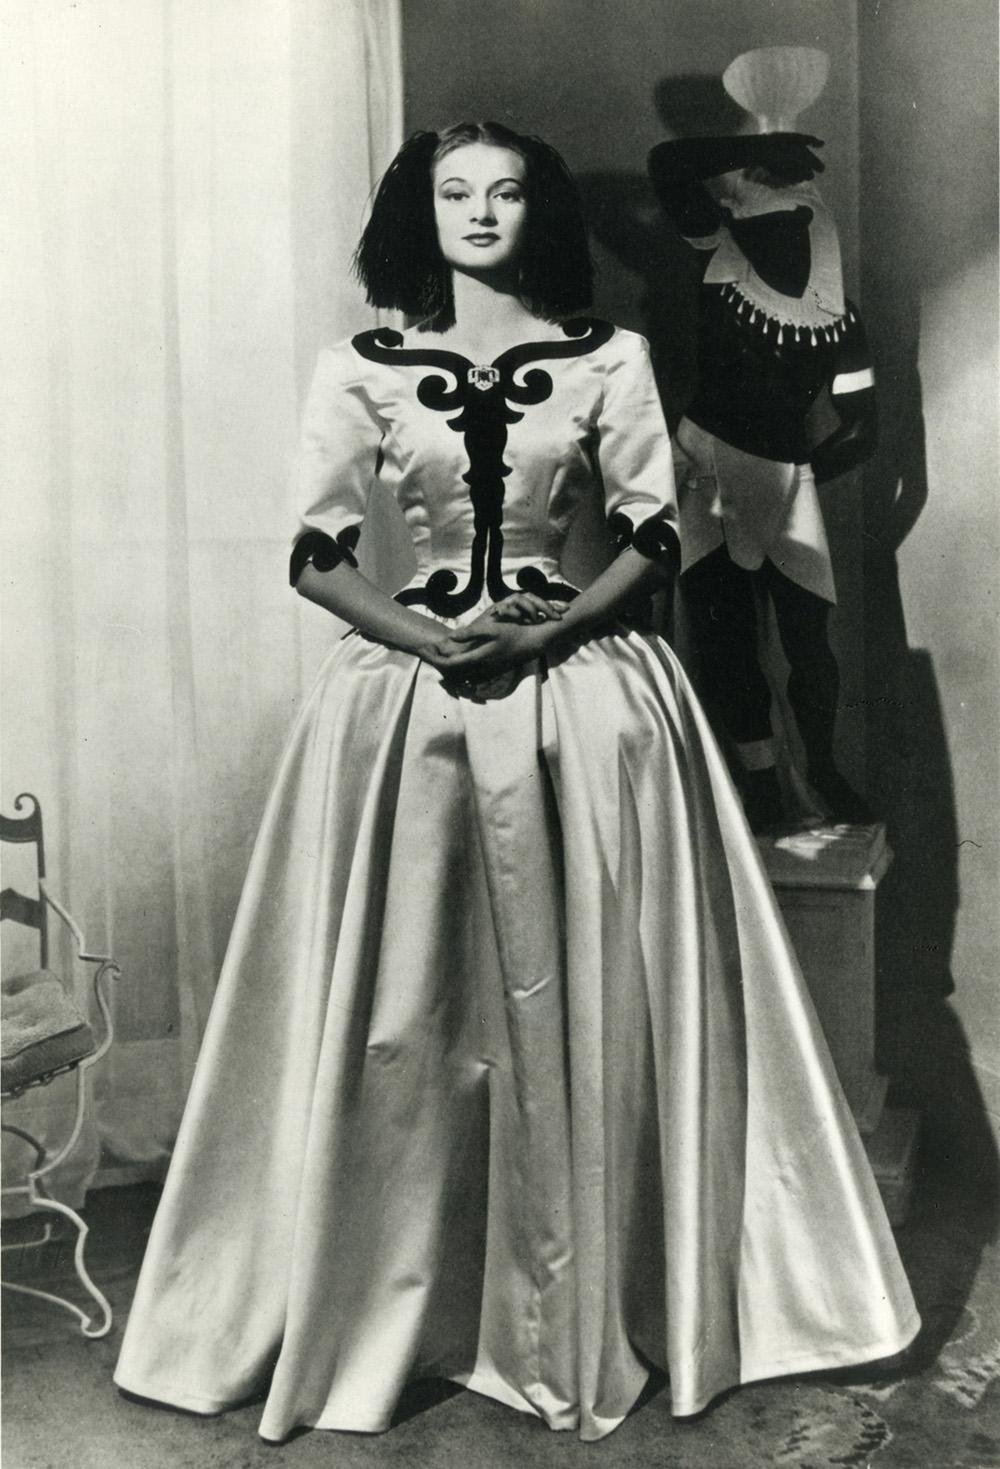 Balenciaga Infanta dress, 1939 (Photo credit: Balenciaga Archives Paris)